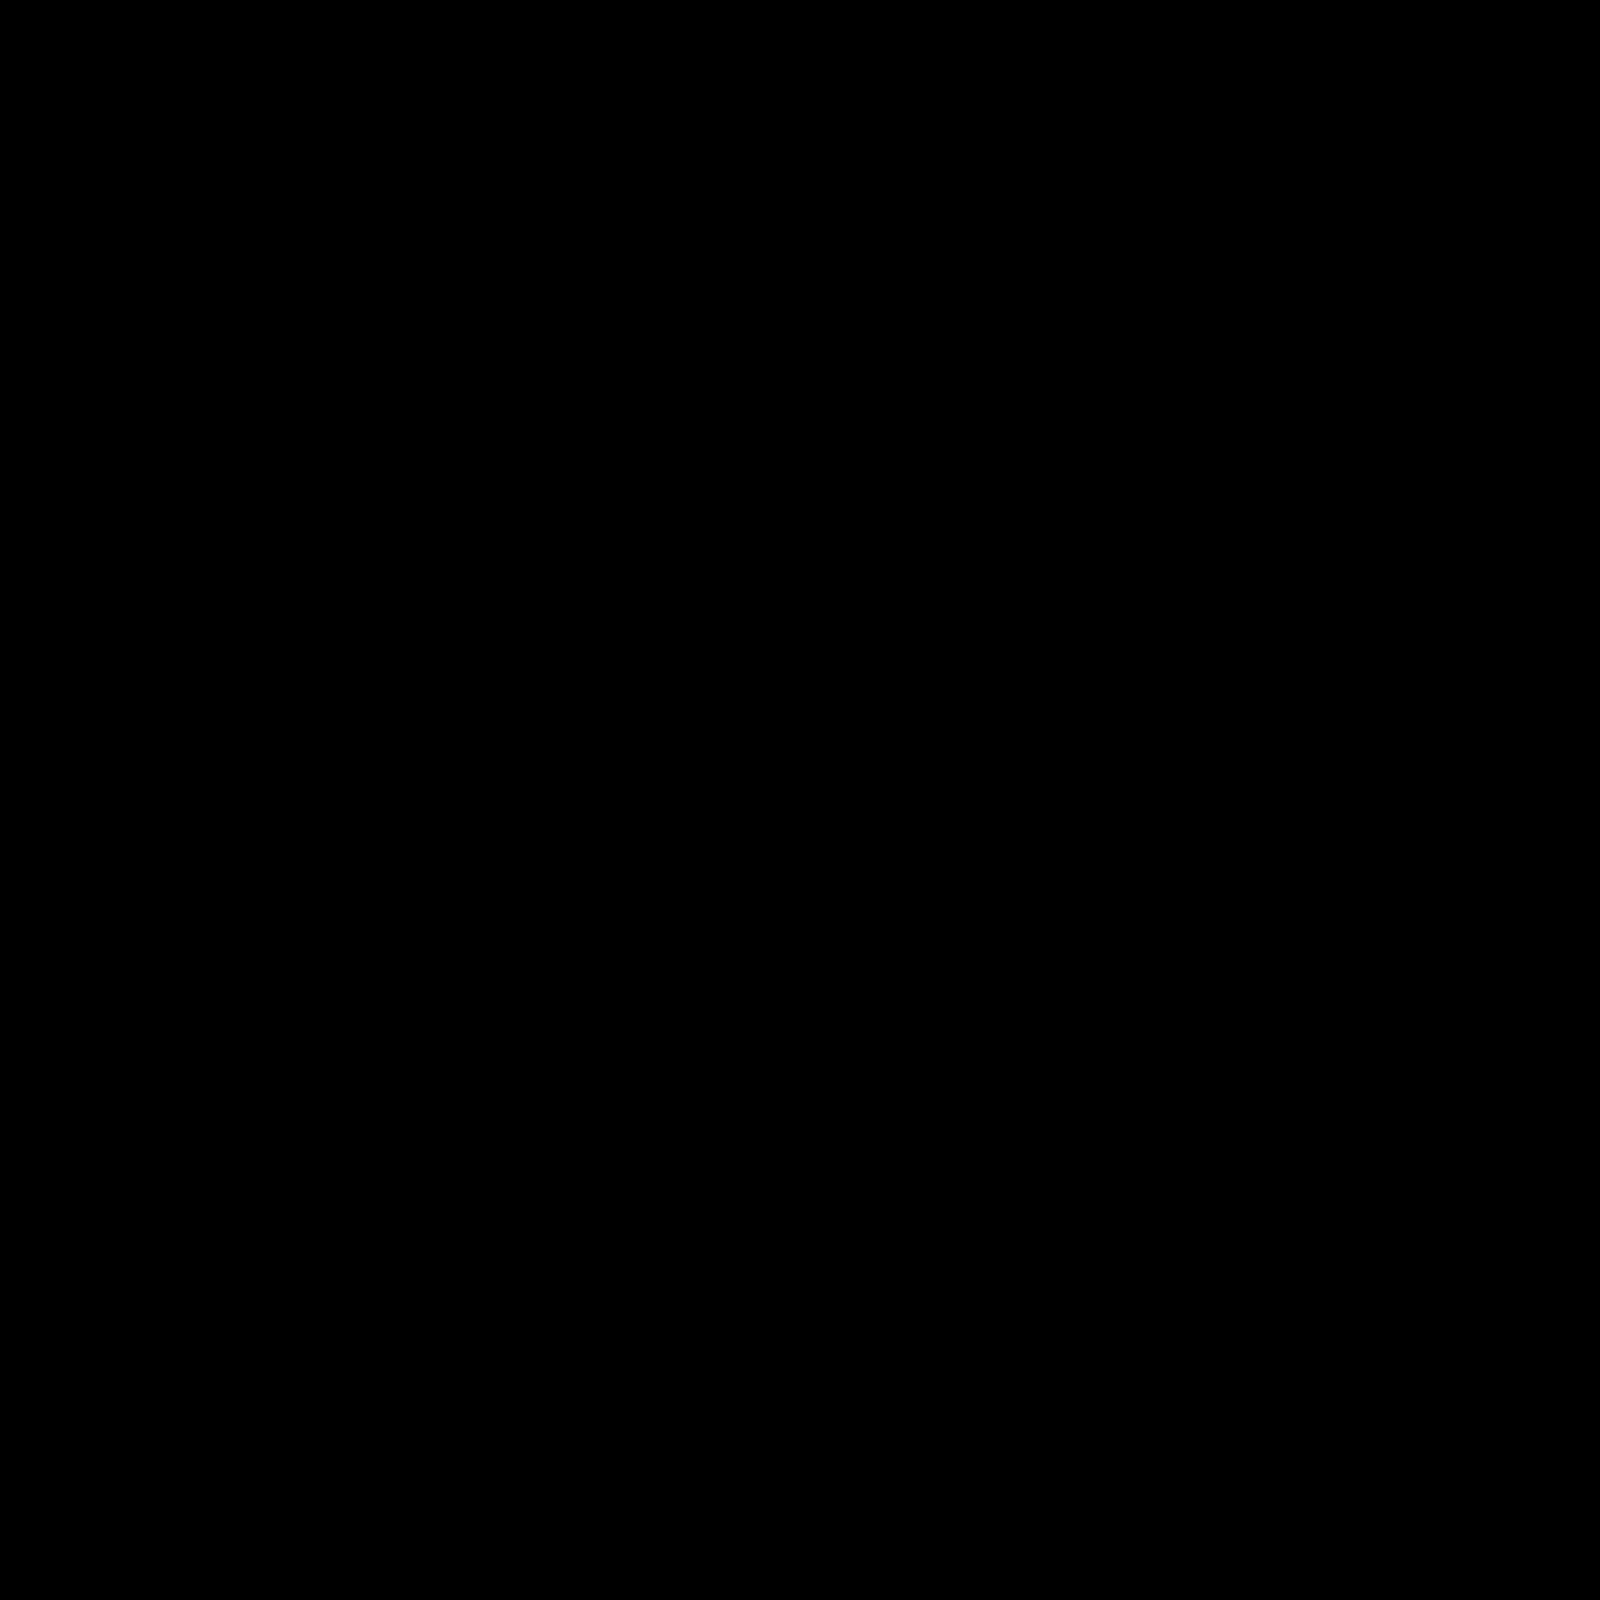 krachtvoer icon